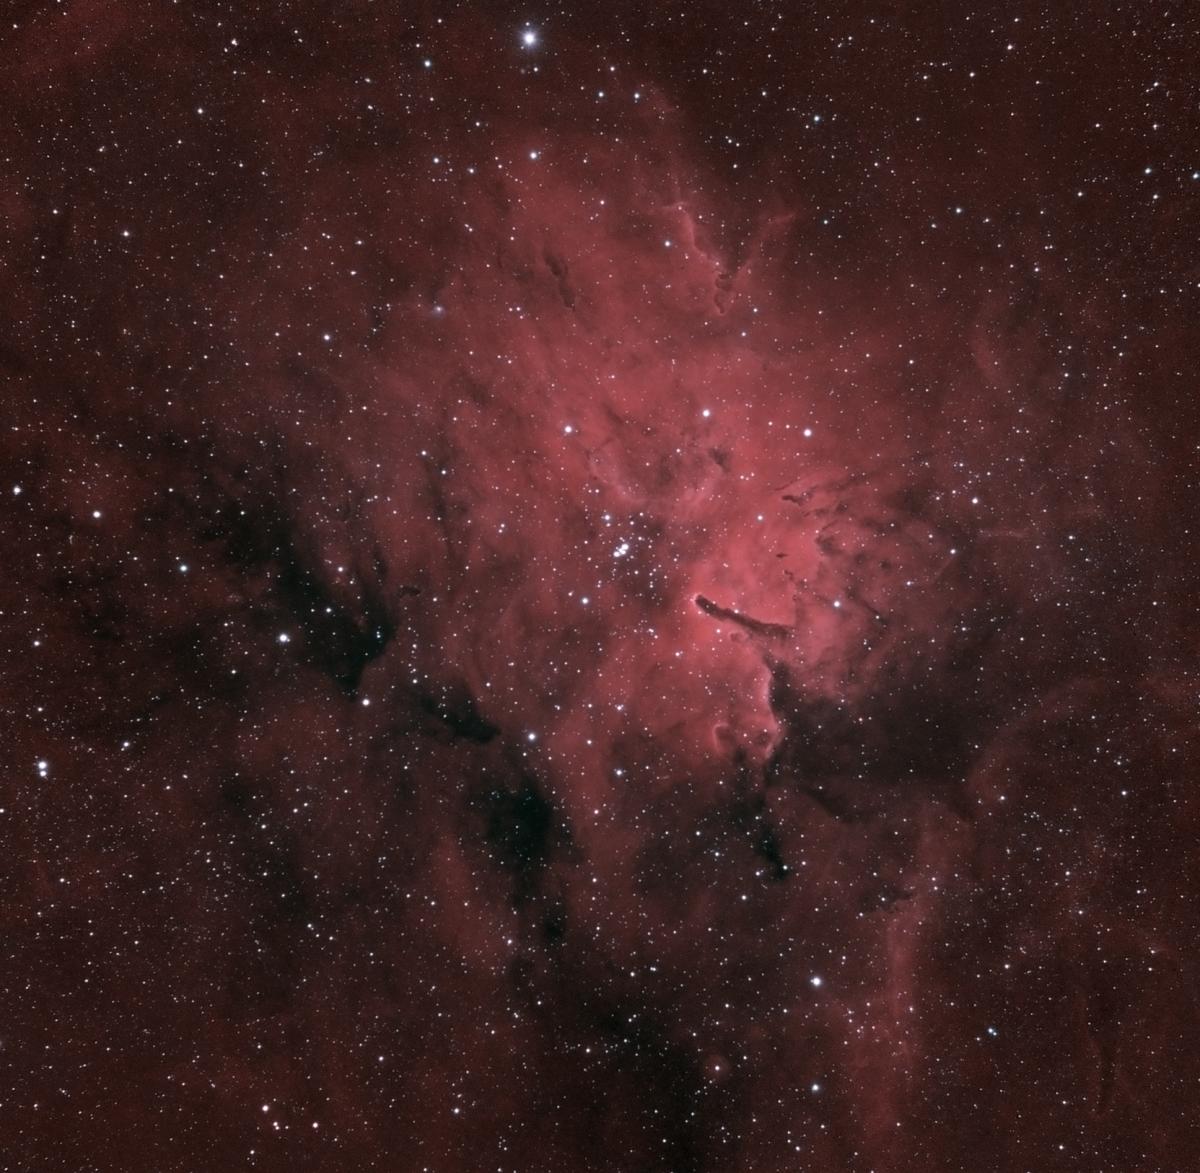 Crv 1 1200x1173 - NGC 6820 Nebula